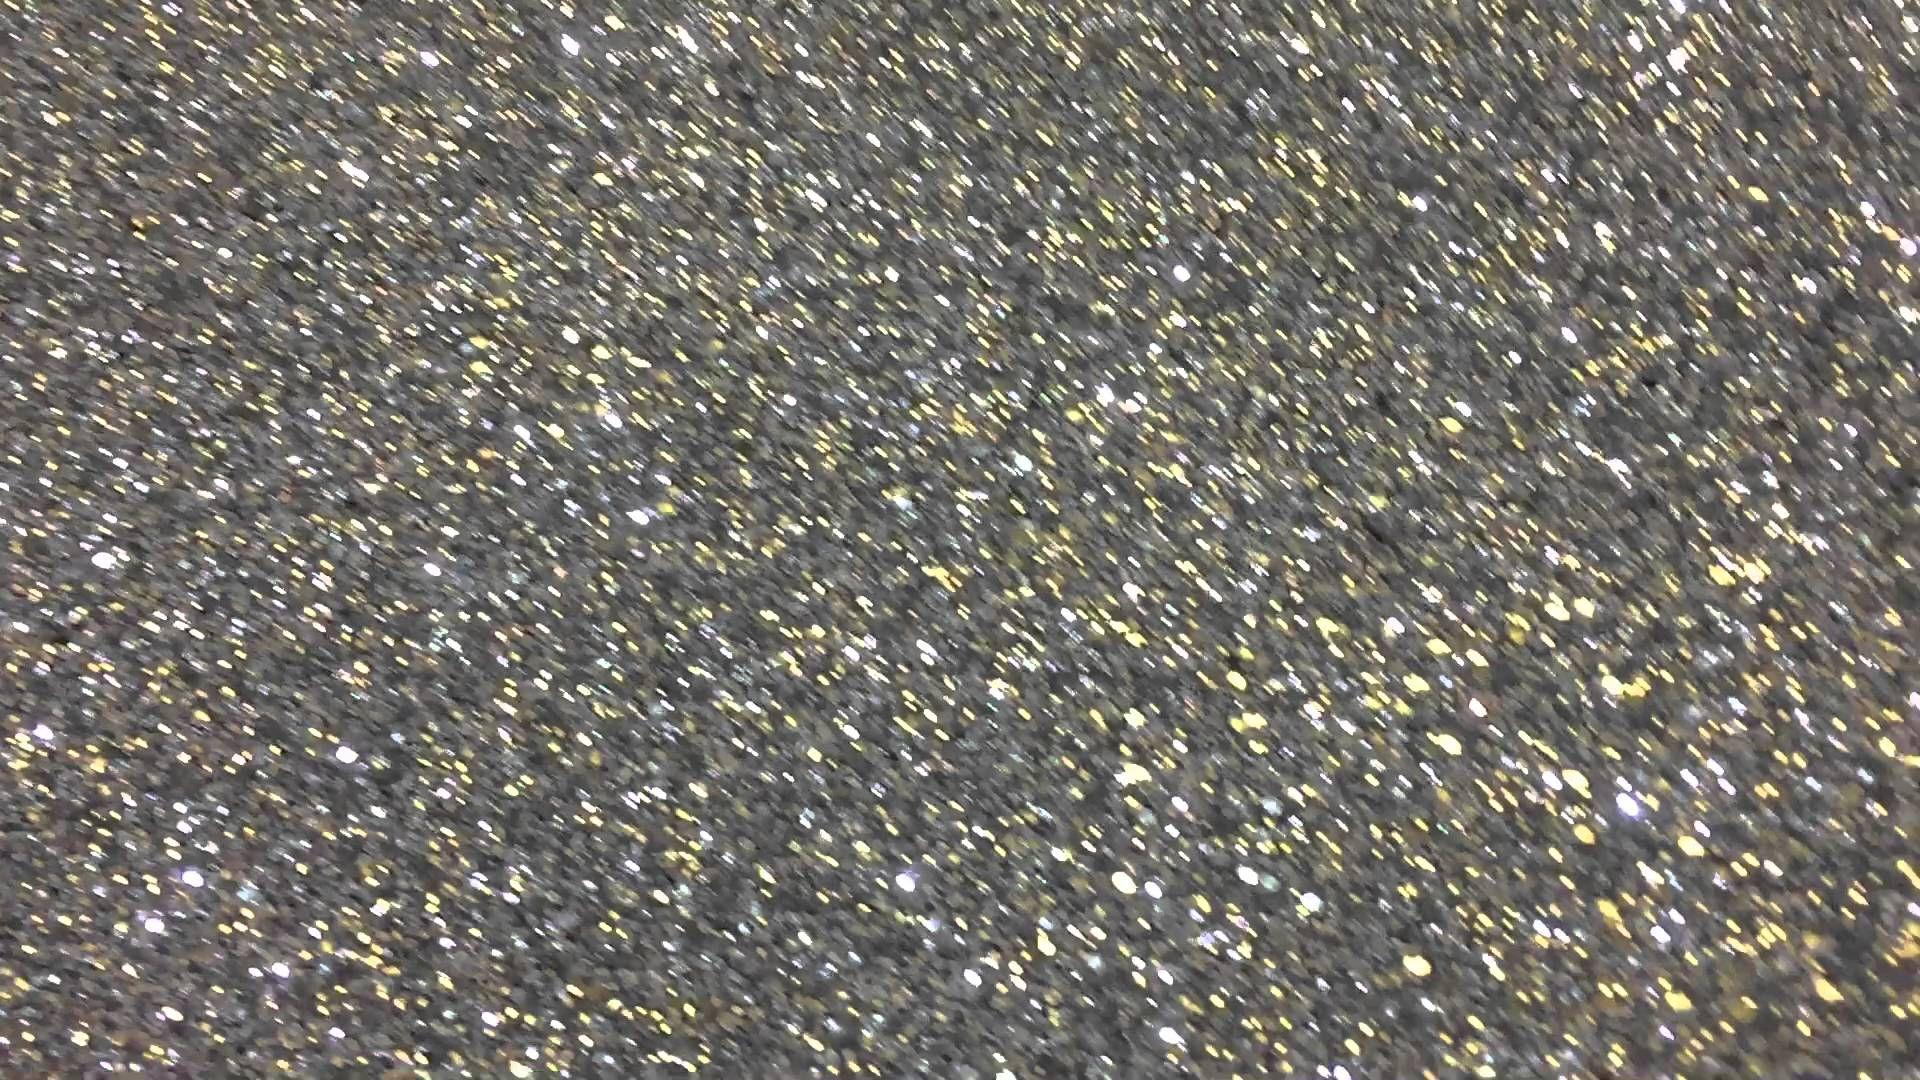 Glitter Wallpapers High Quality Resolution Black Glitter Wallpapers Glitter Wallpaper Silver Glitter Wallpaper